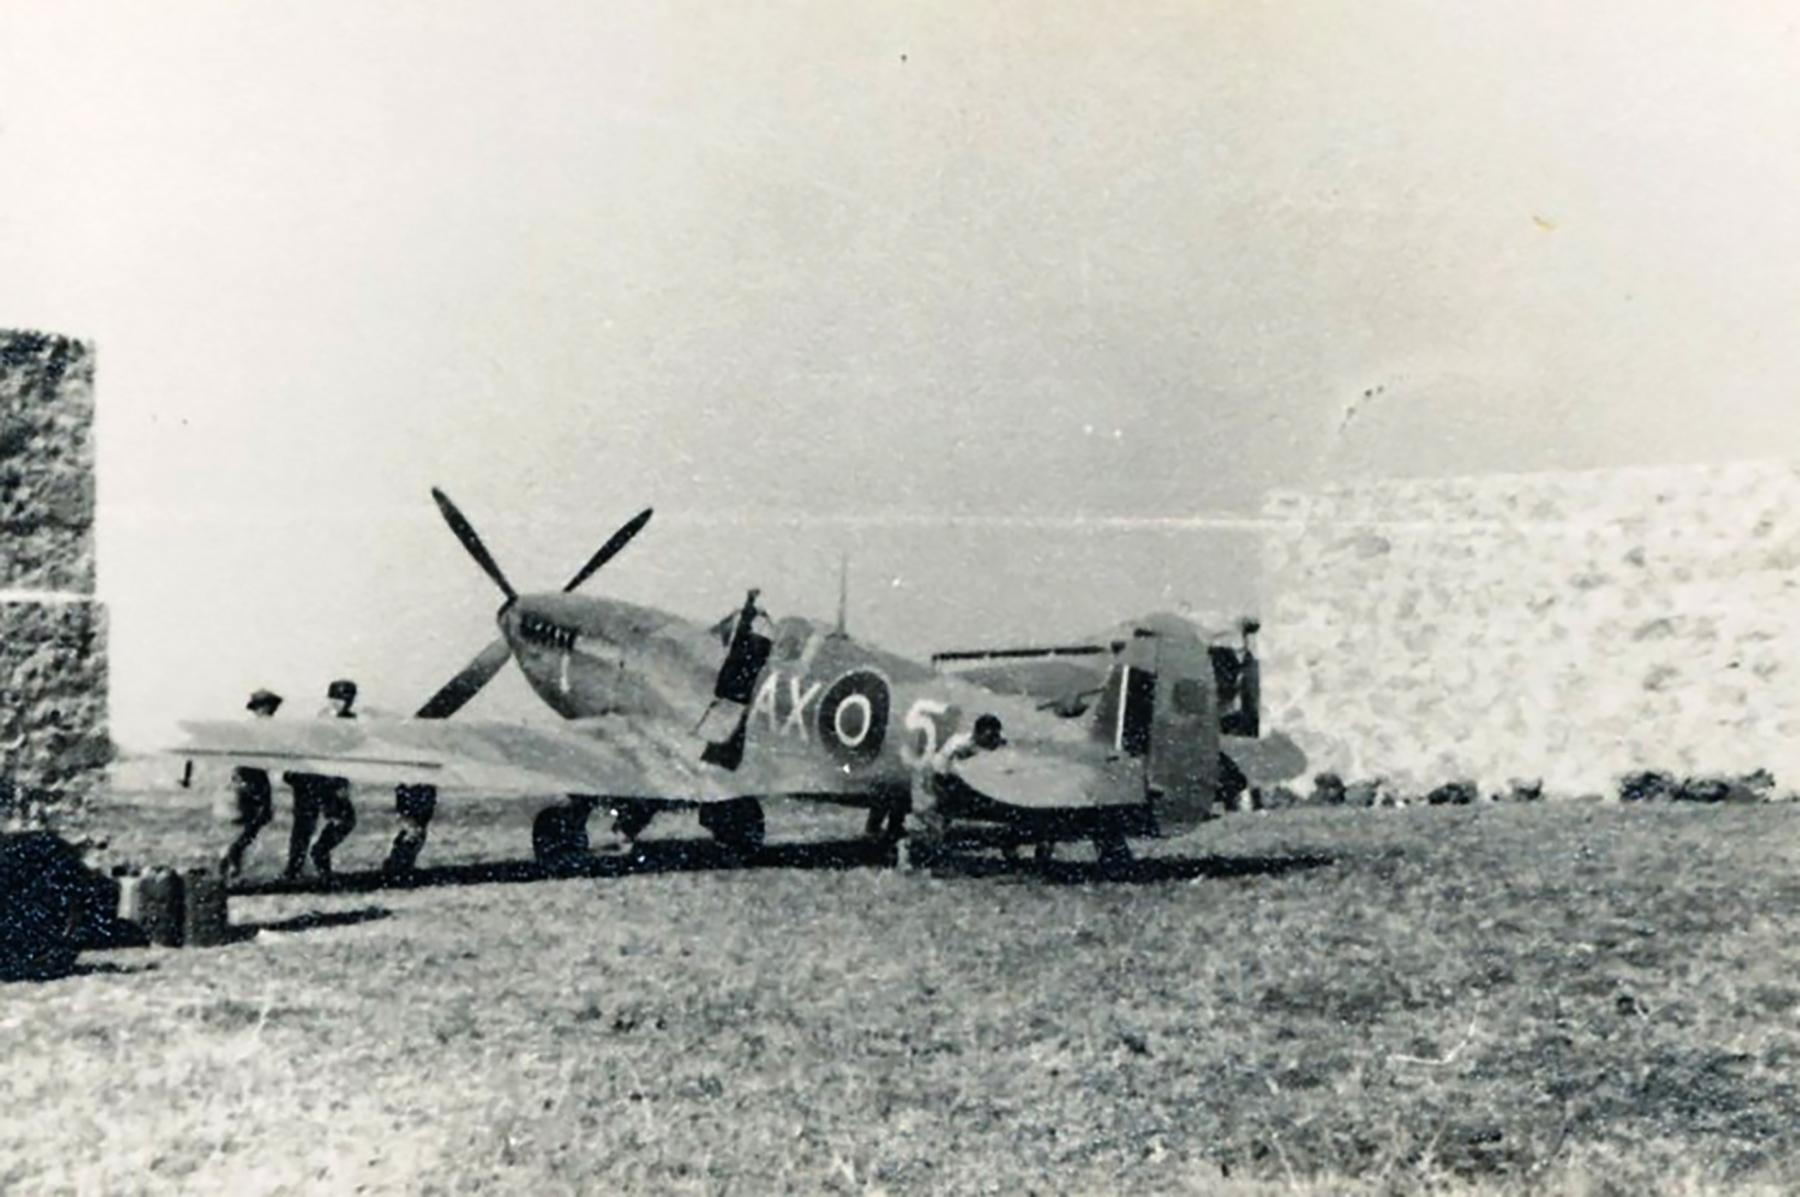 Spitfire MkIX SAAF 1Sqn AX5 Italy 1943 01